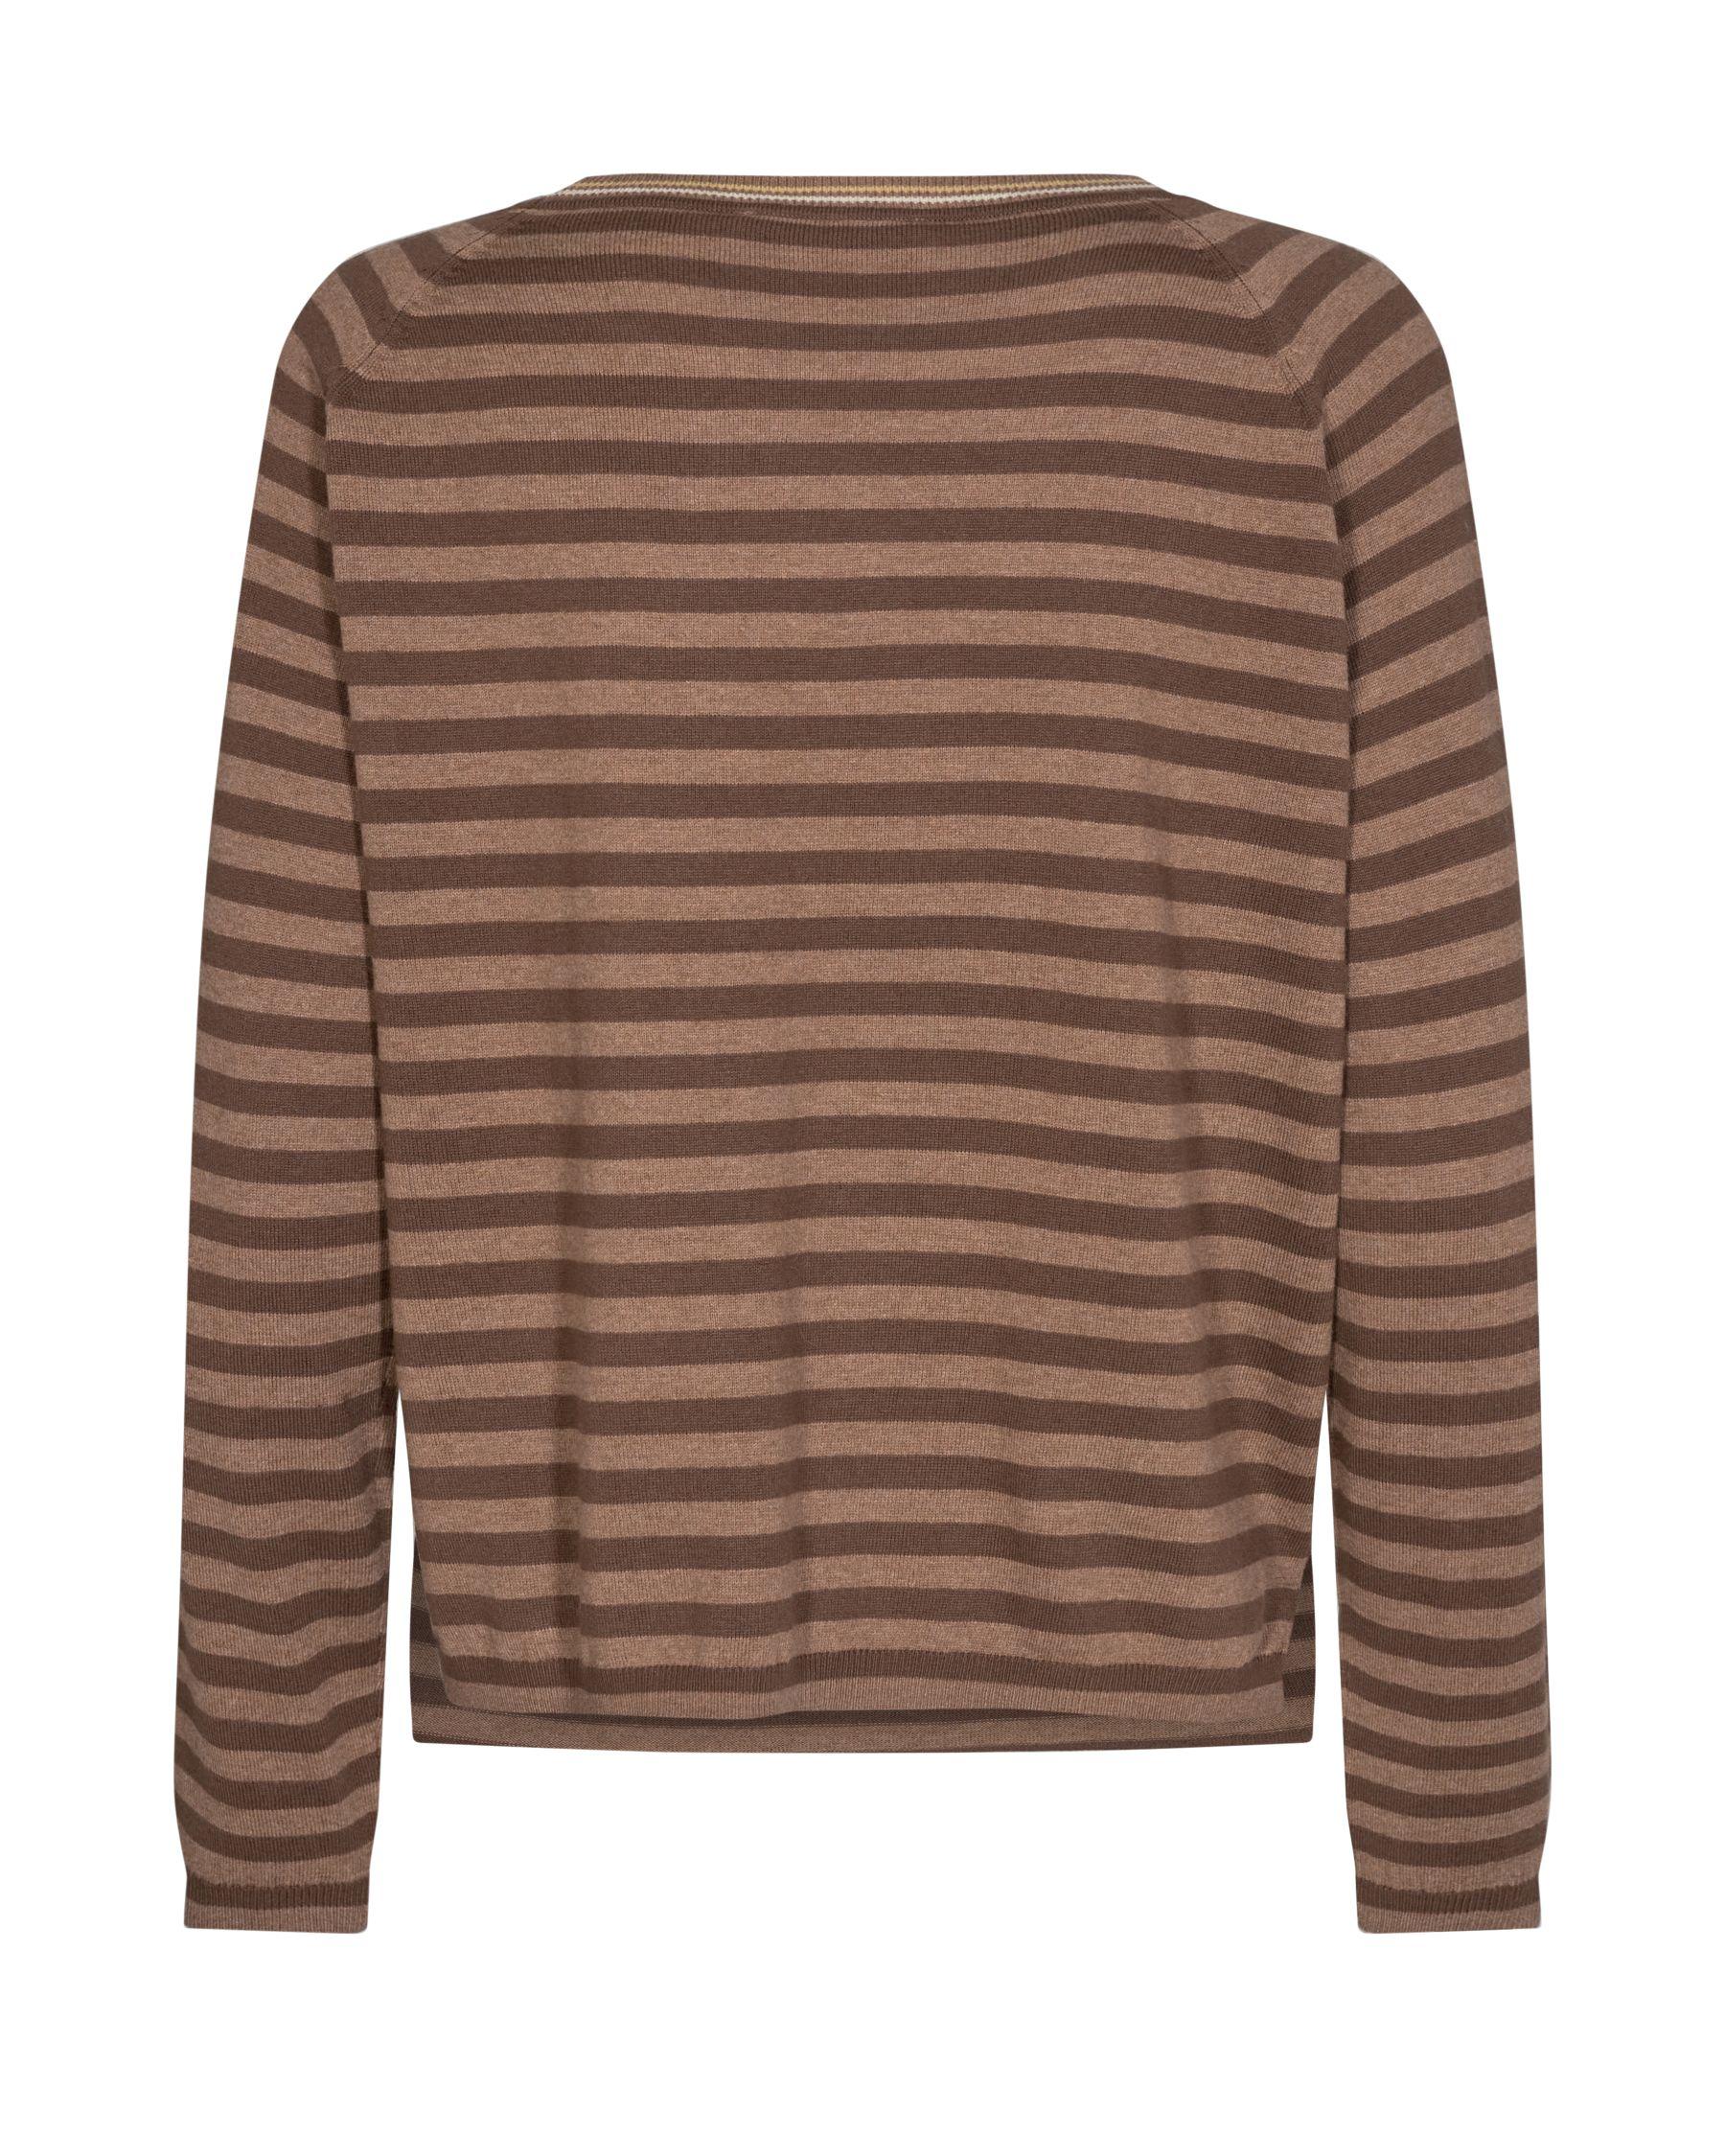 Mos Mosh Wyn Stripe sweatshirt, woodsmoke, M